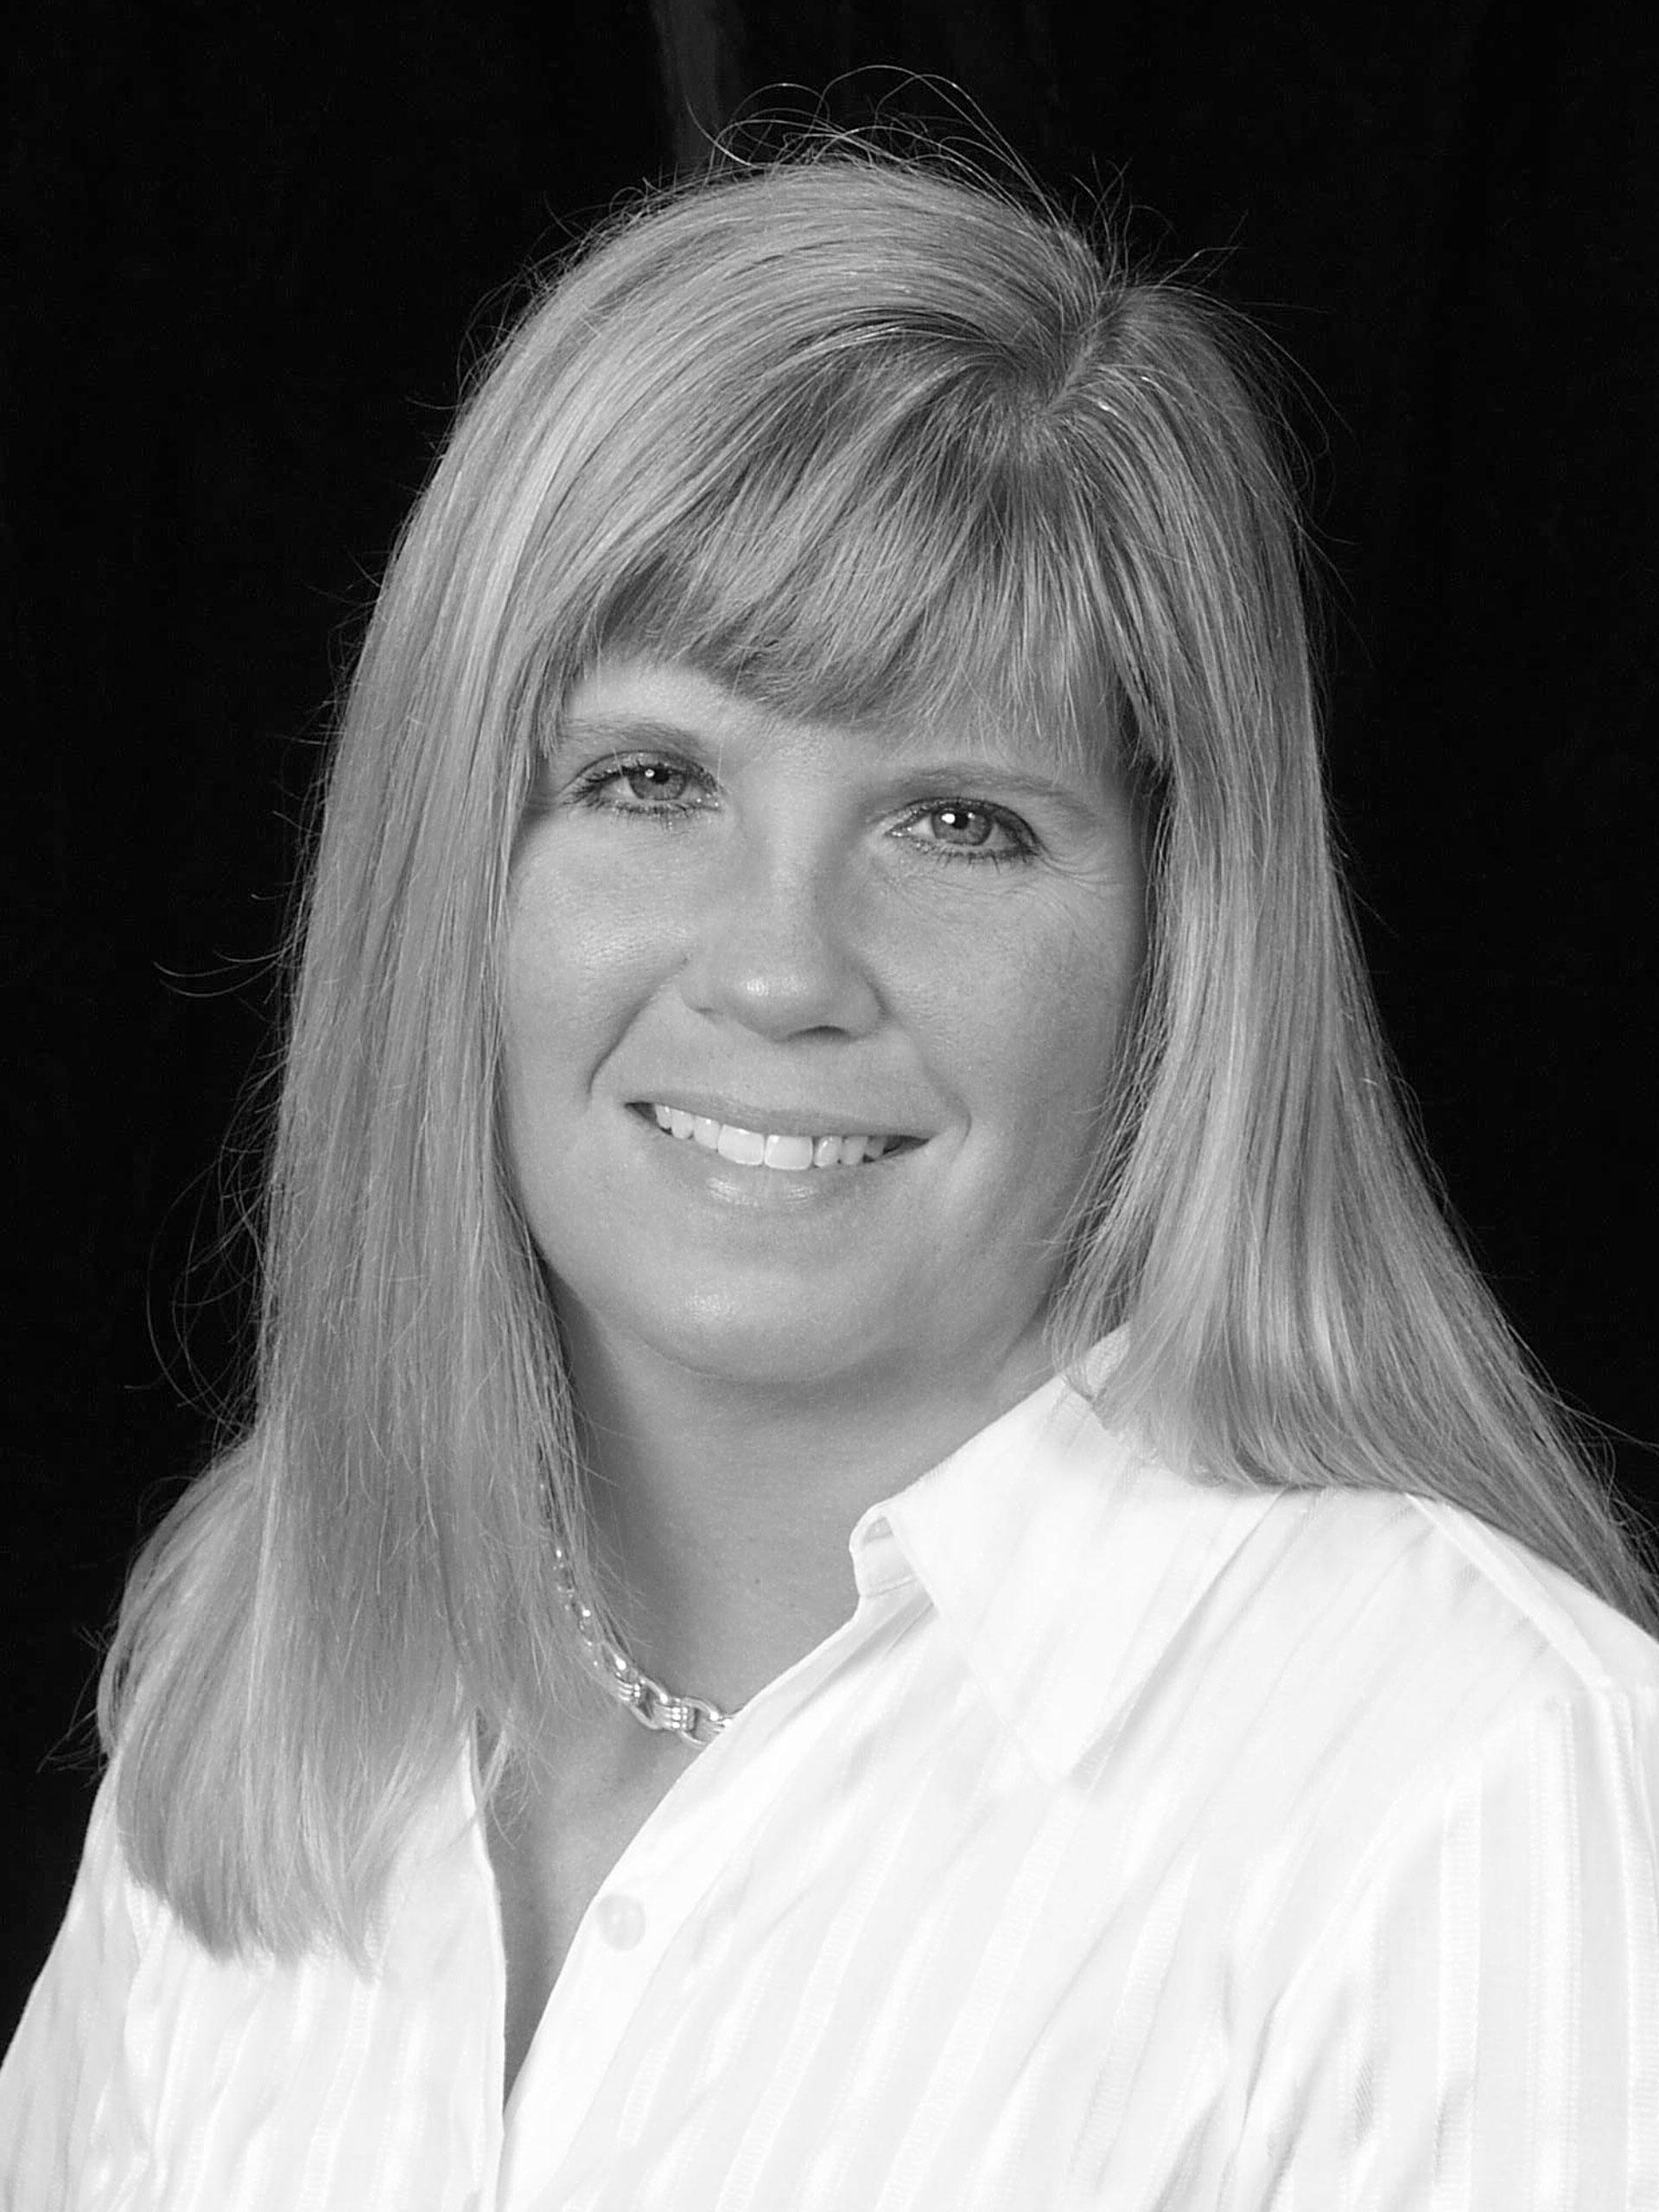 Kimberly Monrow